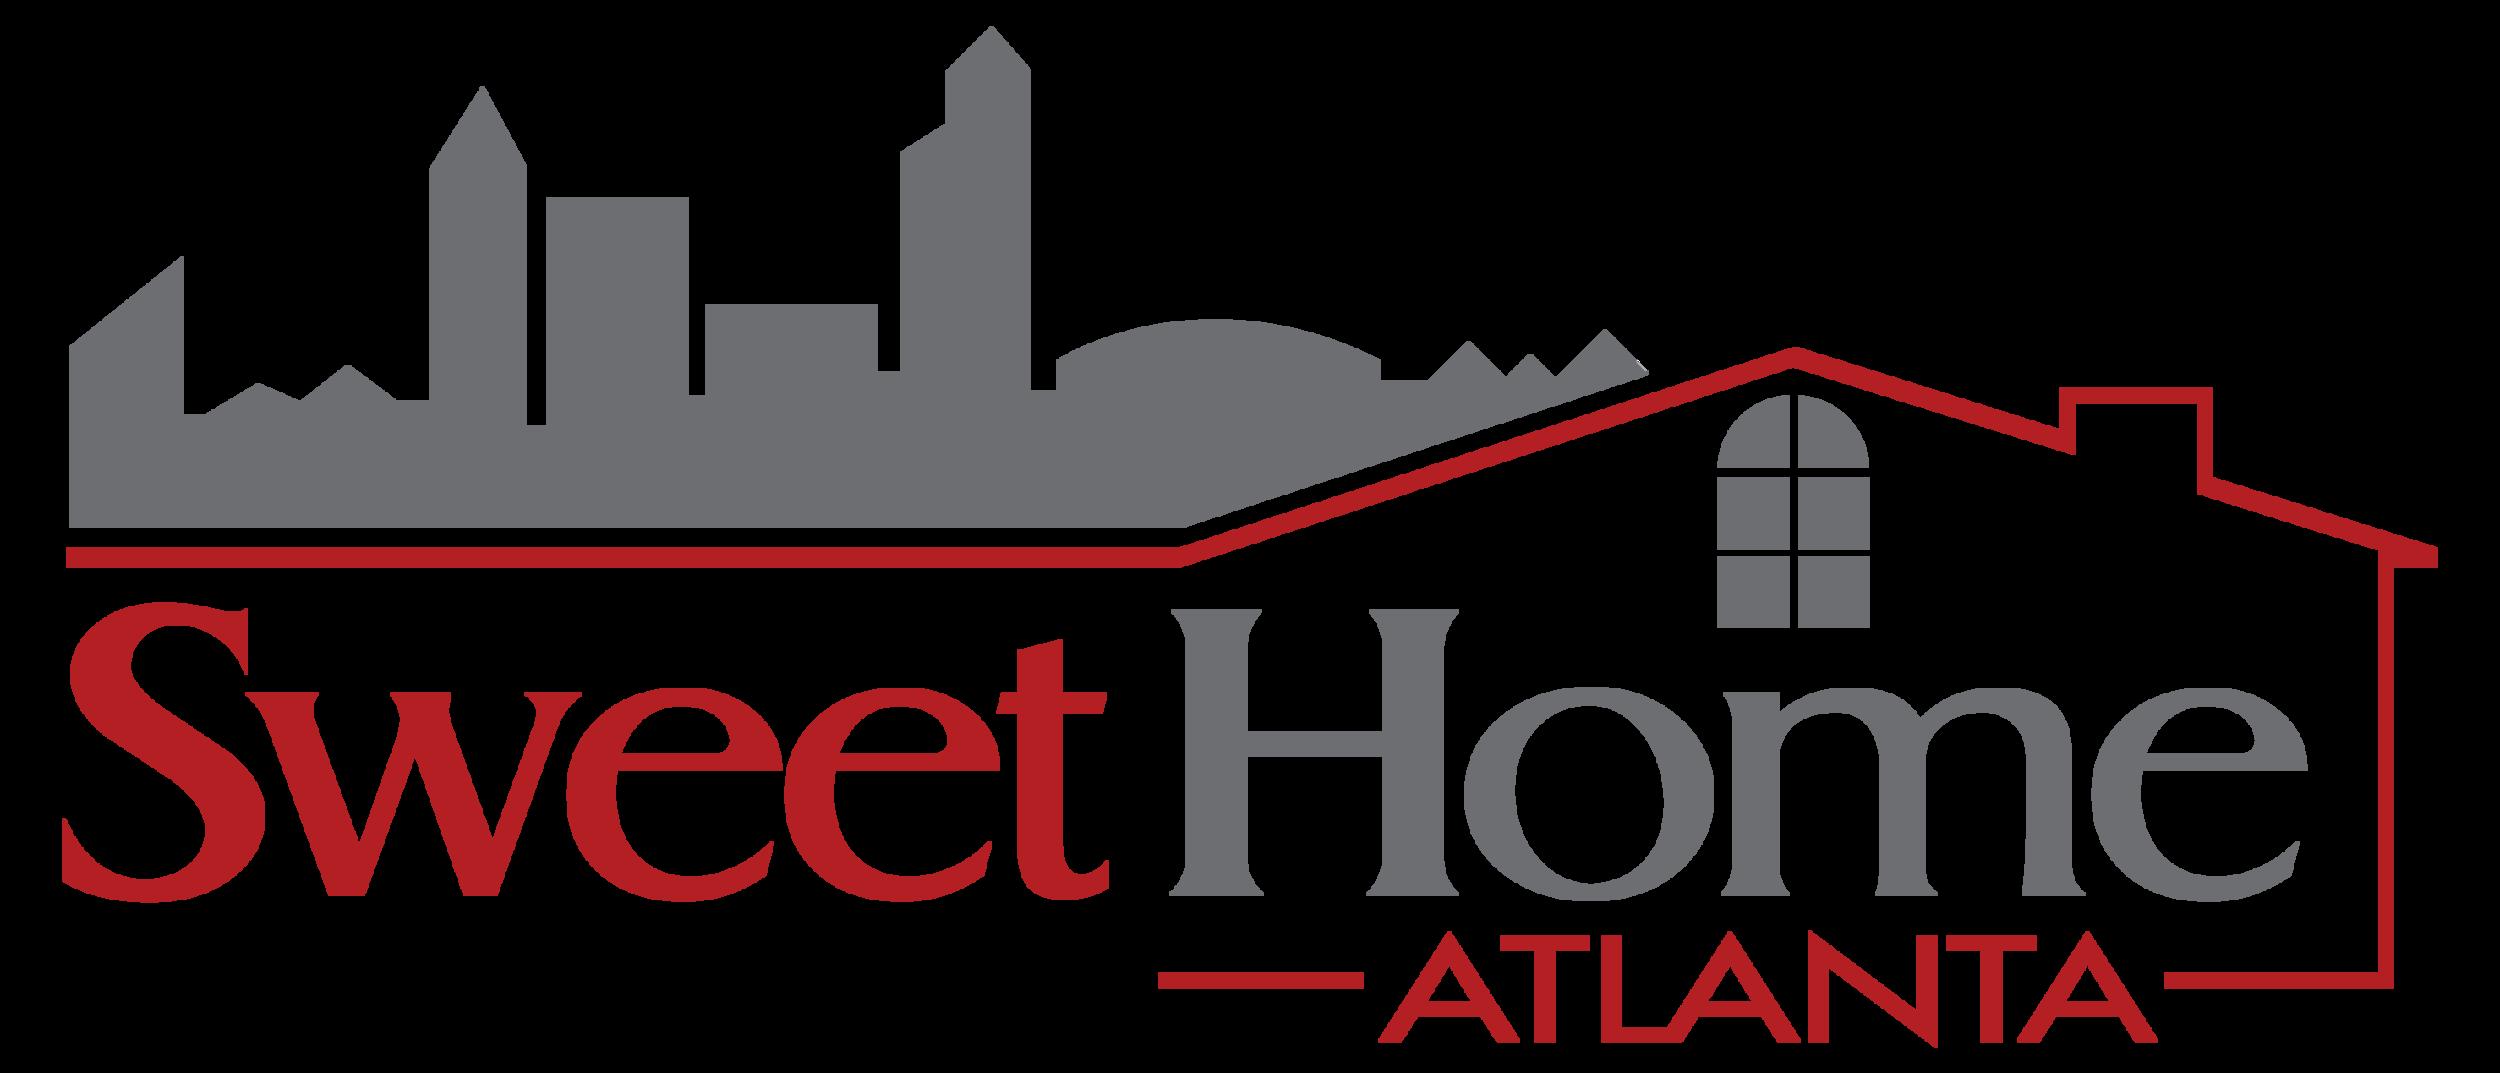 Sweet Home Atl Logo_RGB_Hi Res.png